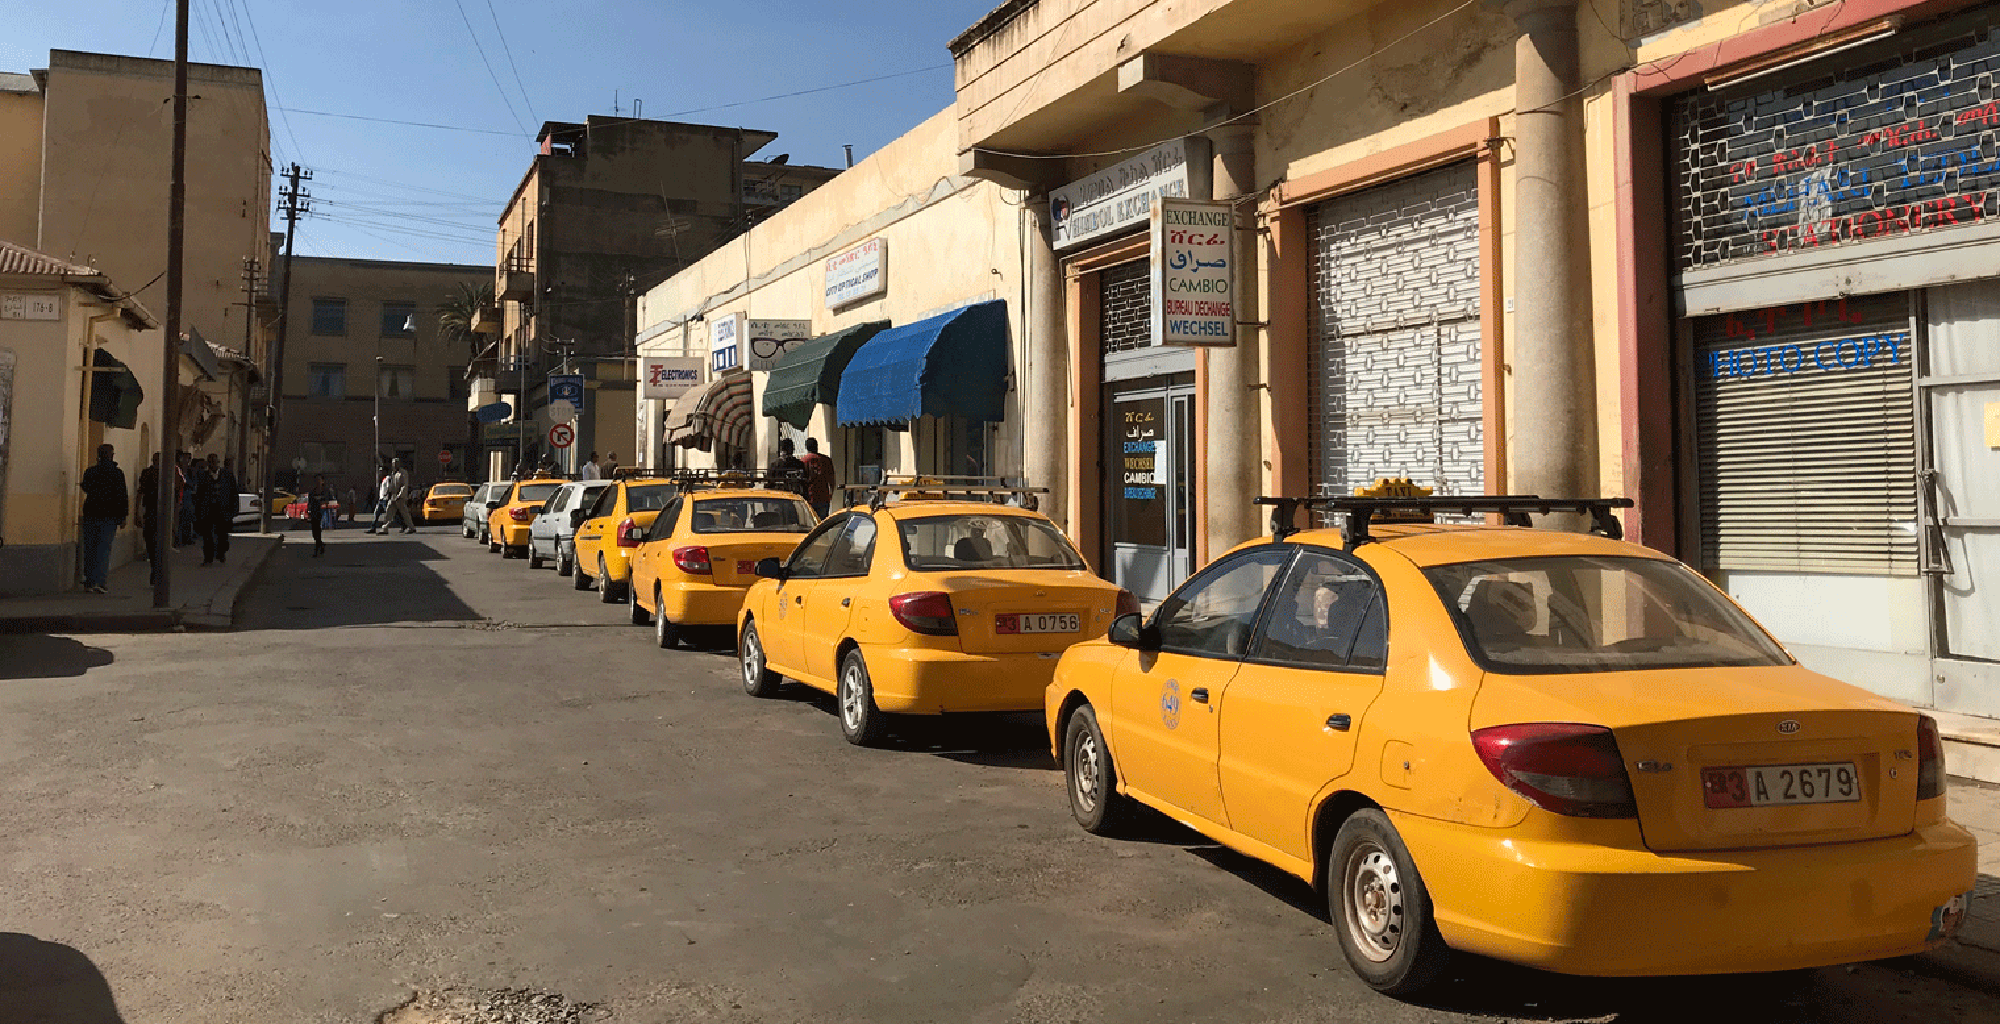 Eritrea-Asmara-City-Taxi